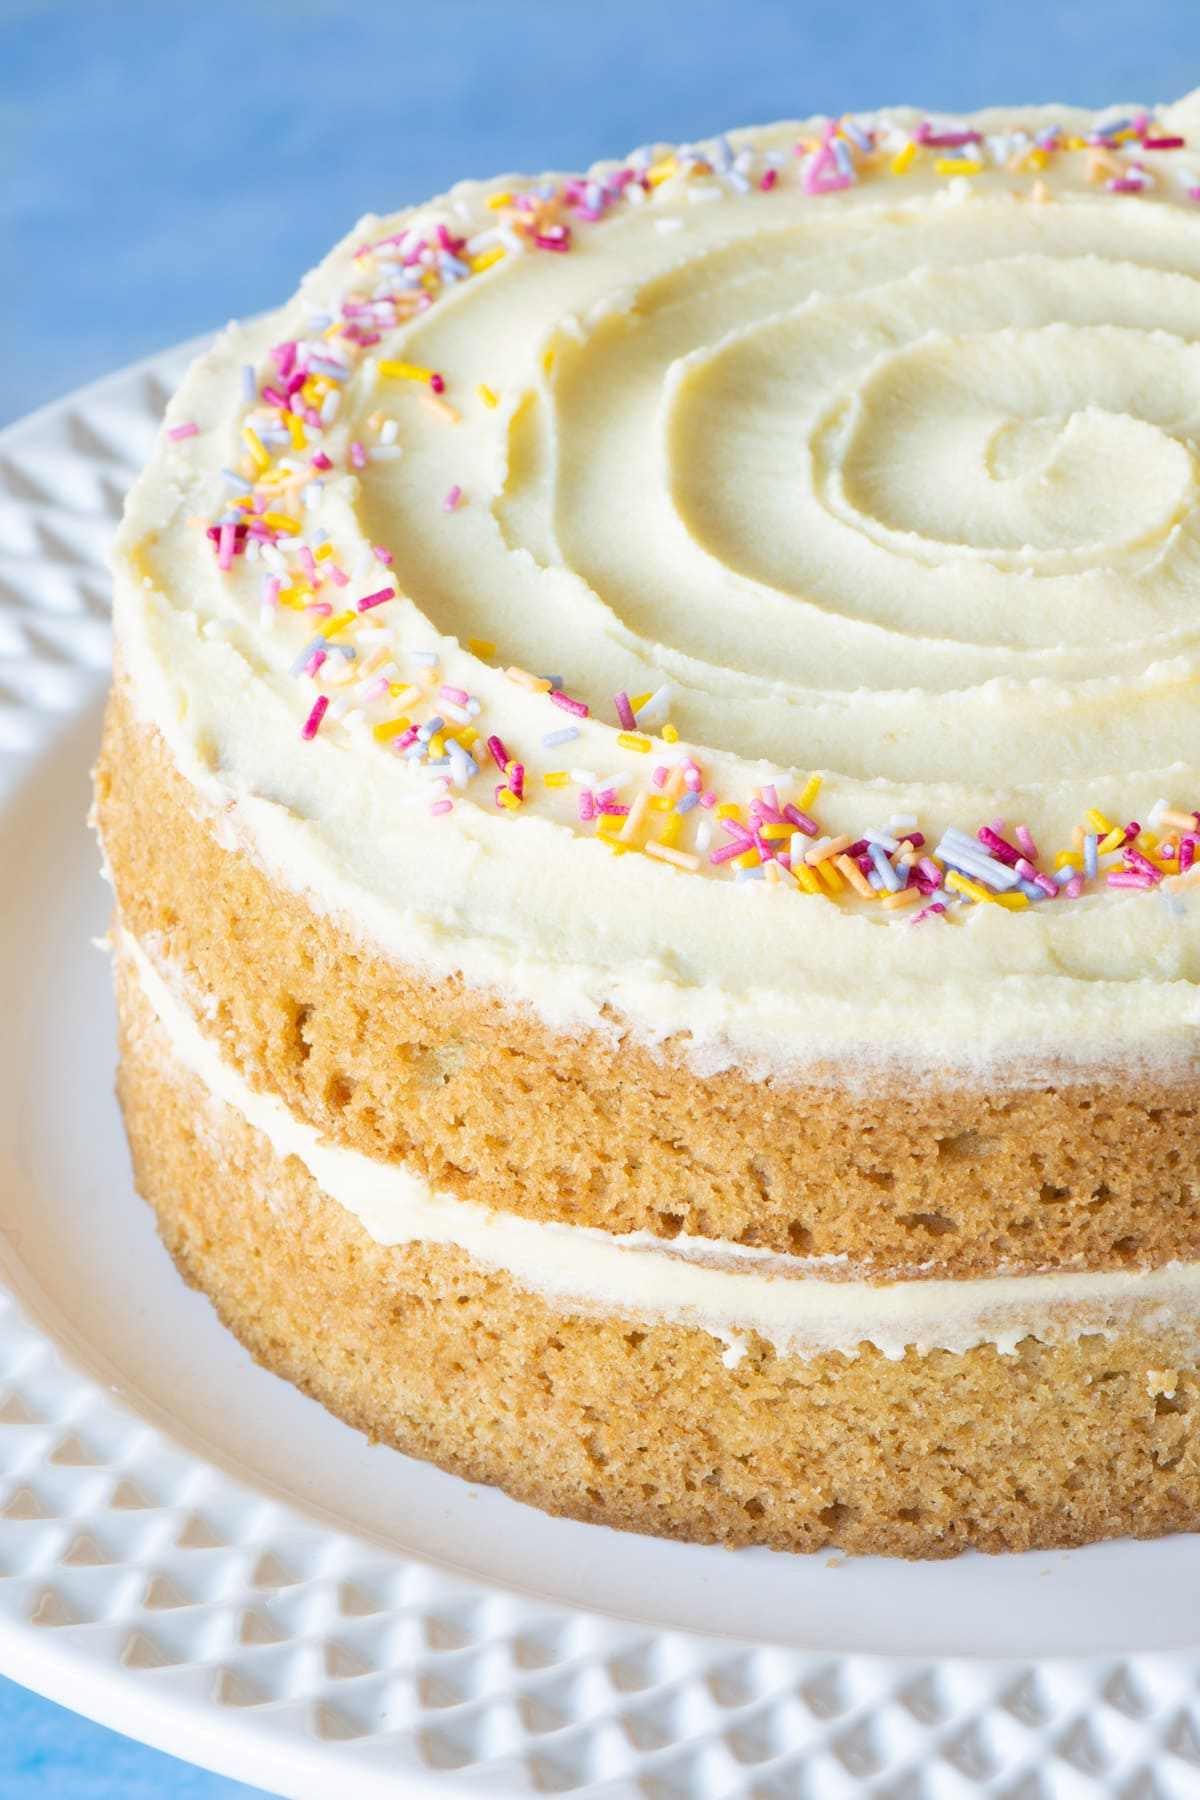 A vegan vanilla cake on a cake stand.